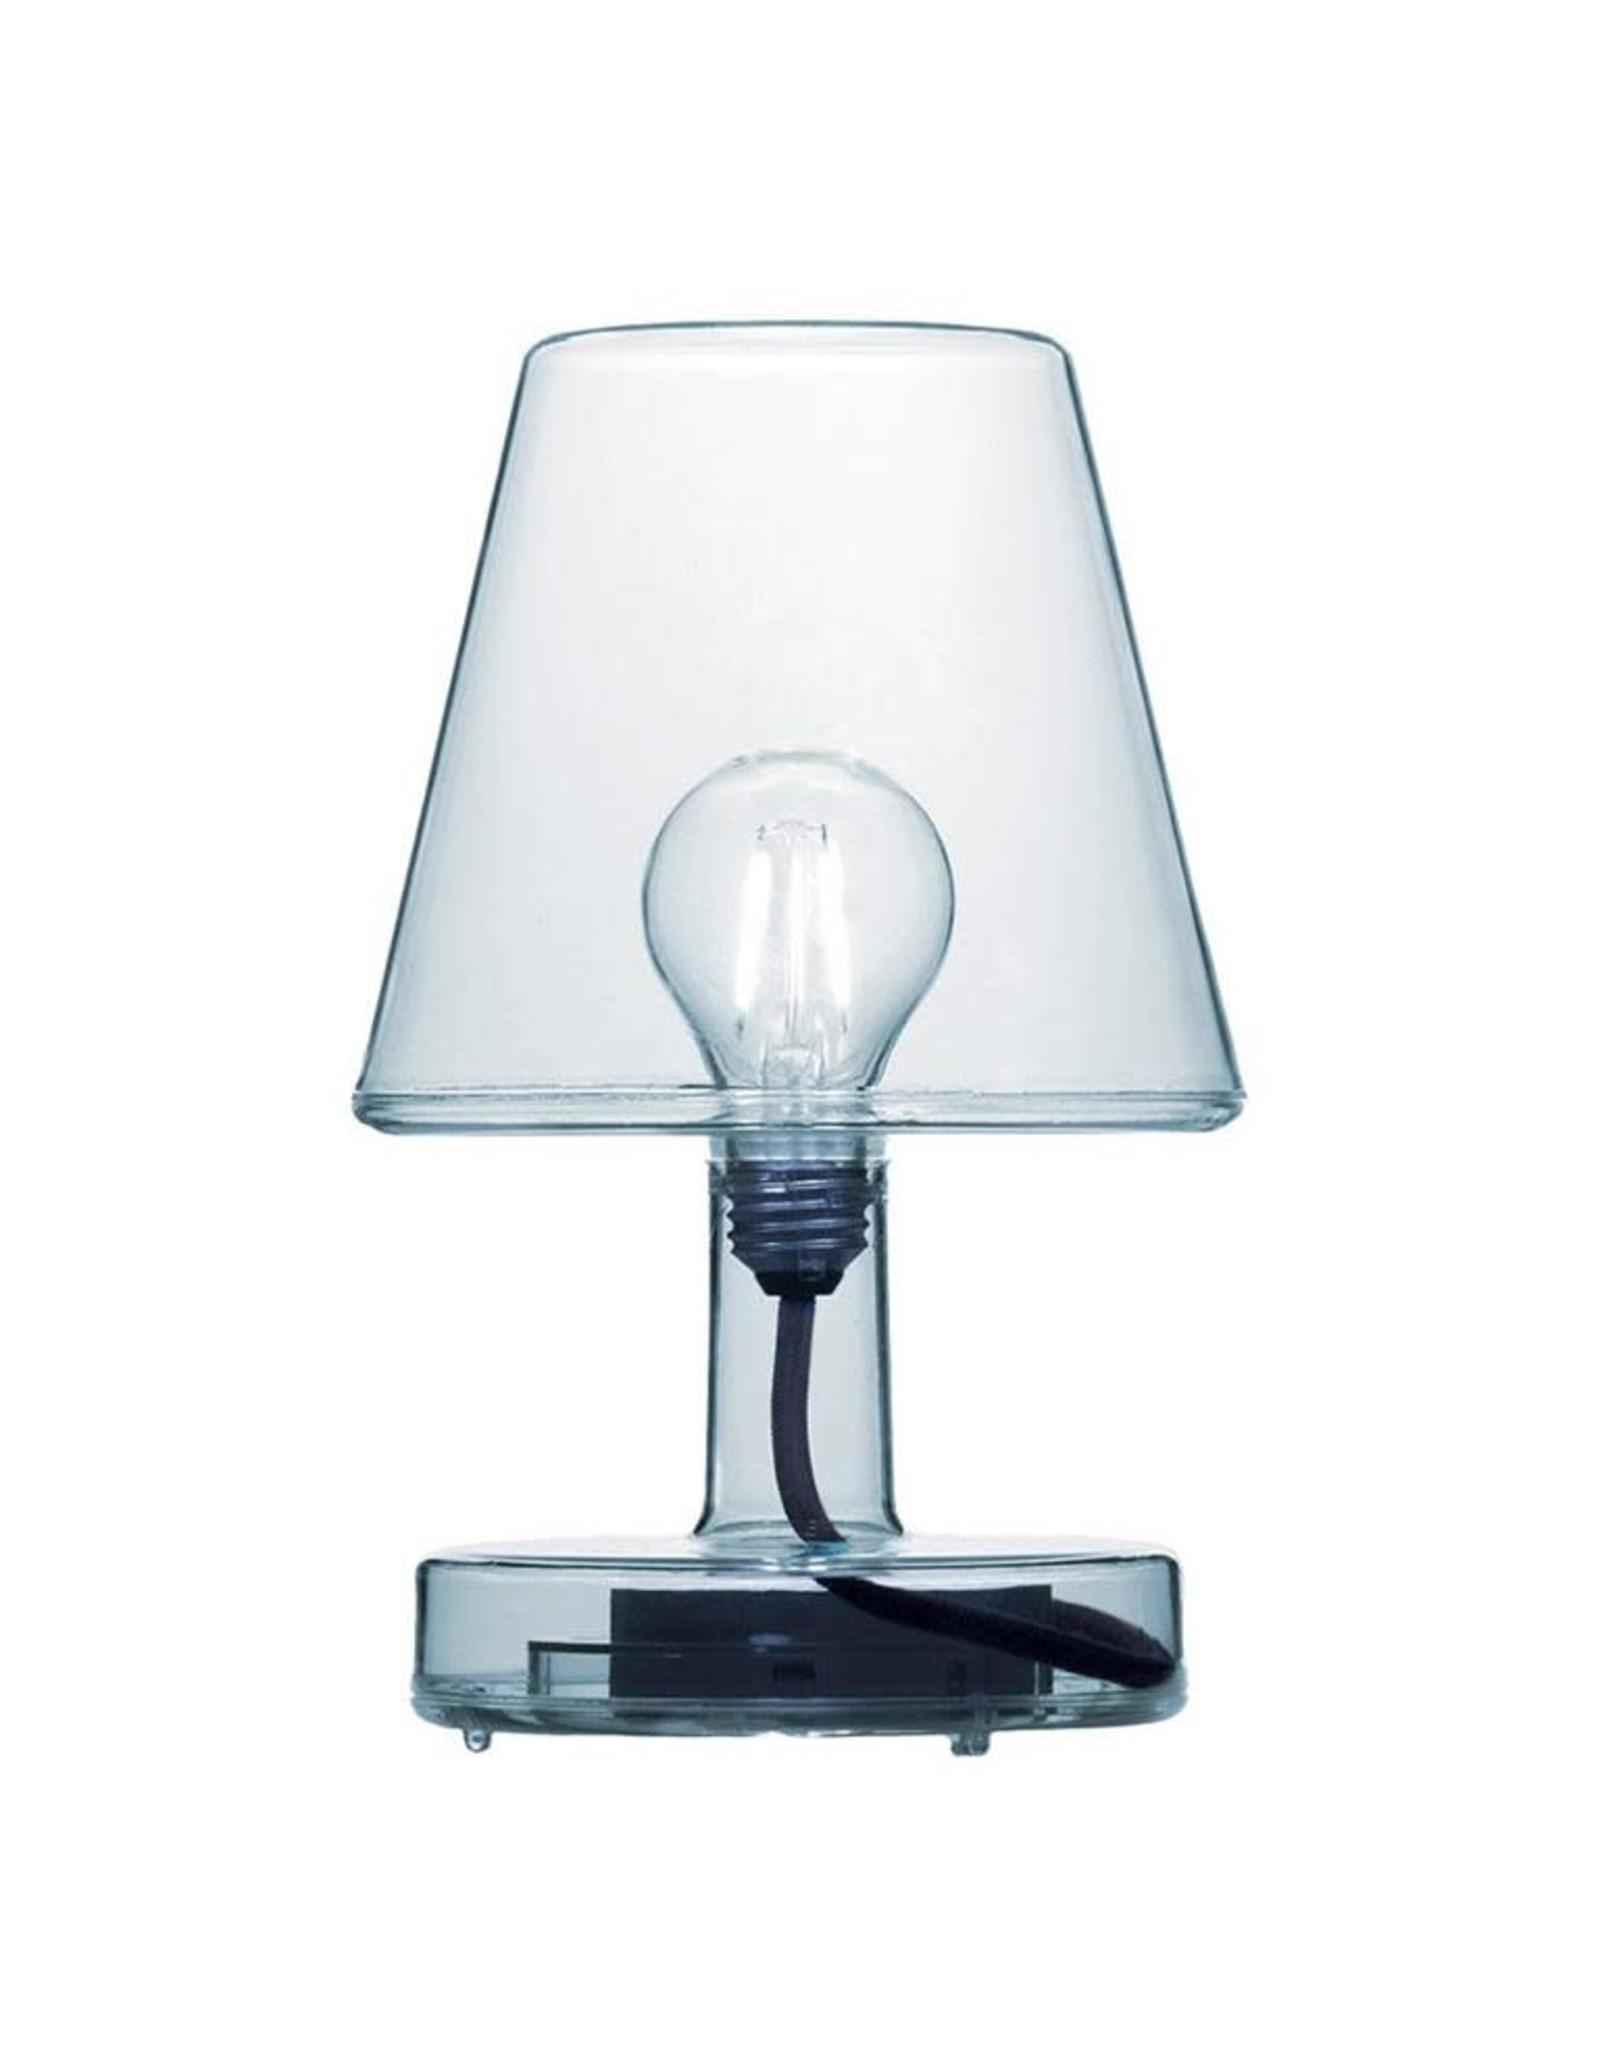 Fatboy FATBOY - TRANSLOETJE lamp